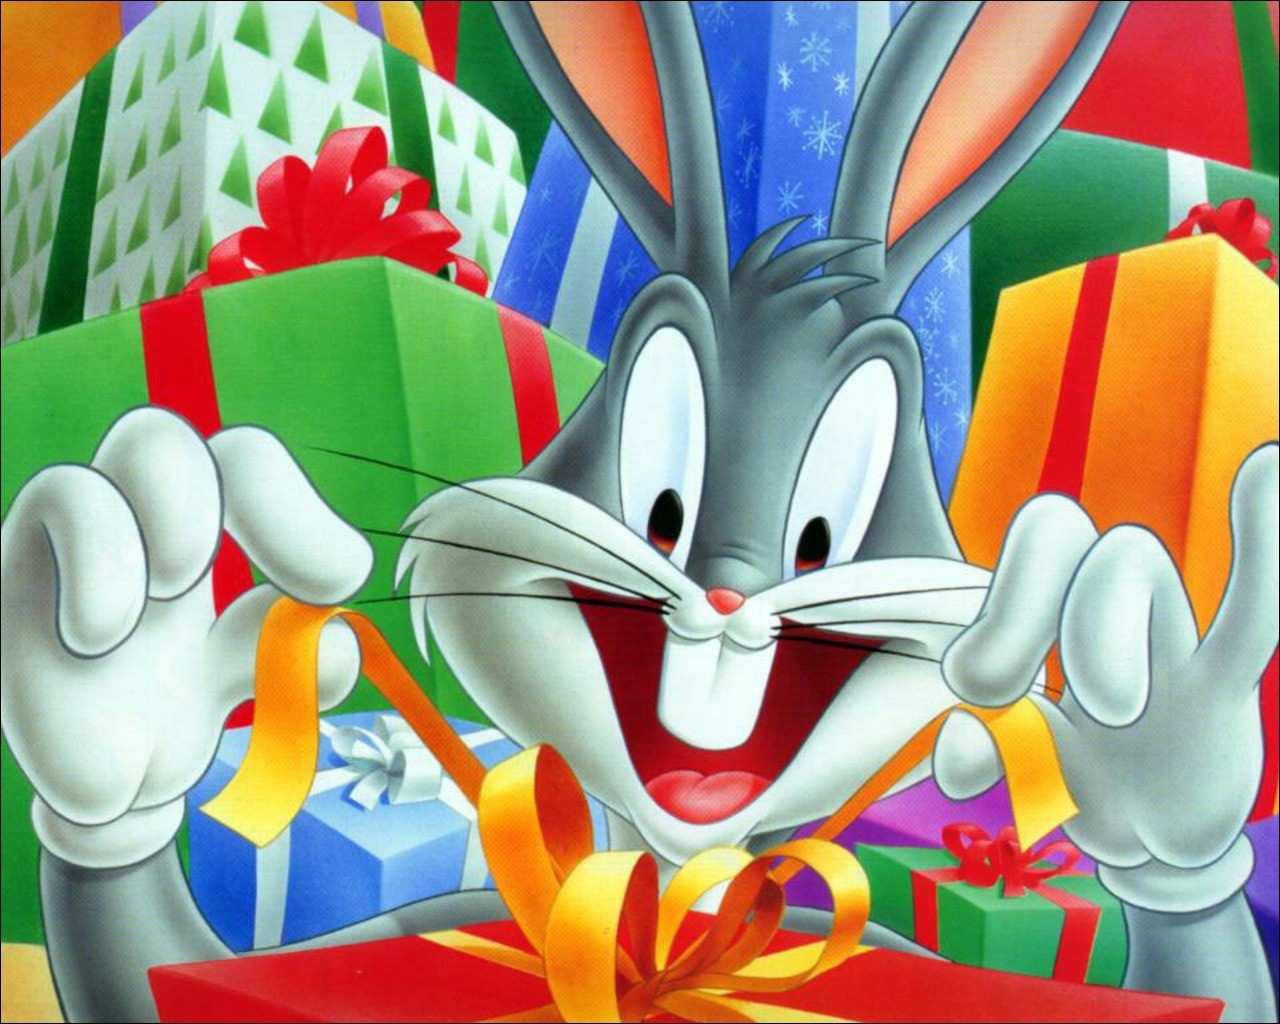 Ausmalbilder Bugs Bunny Einzigartig Malvorlagen Bugs Bunny Aufnahme Bugs Bunny Wallpapers for Desktop Fotografieren